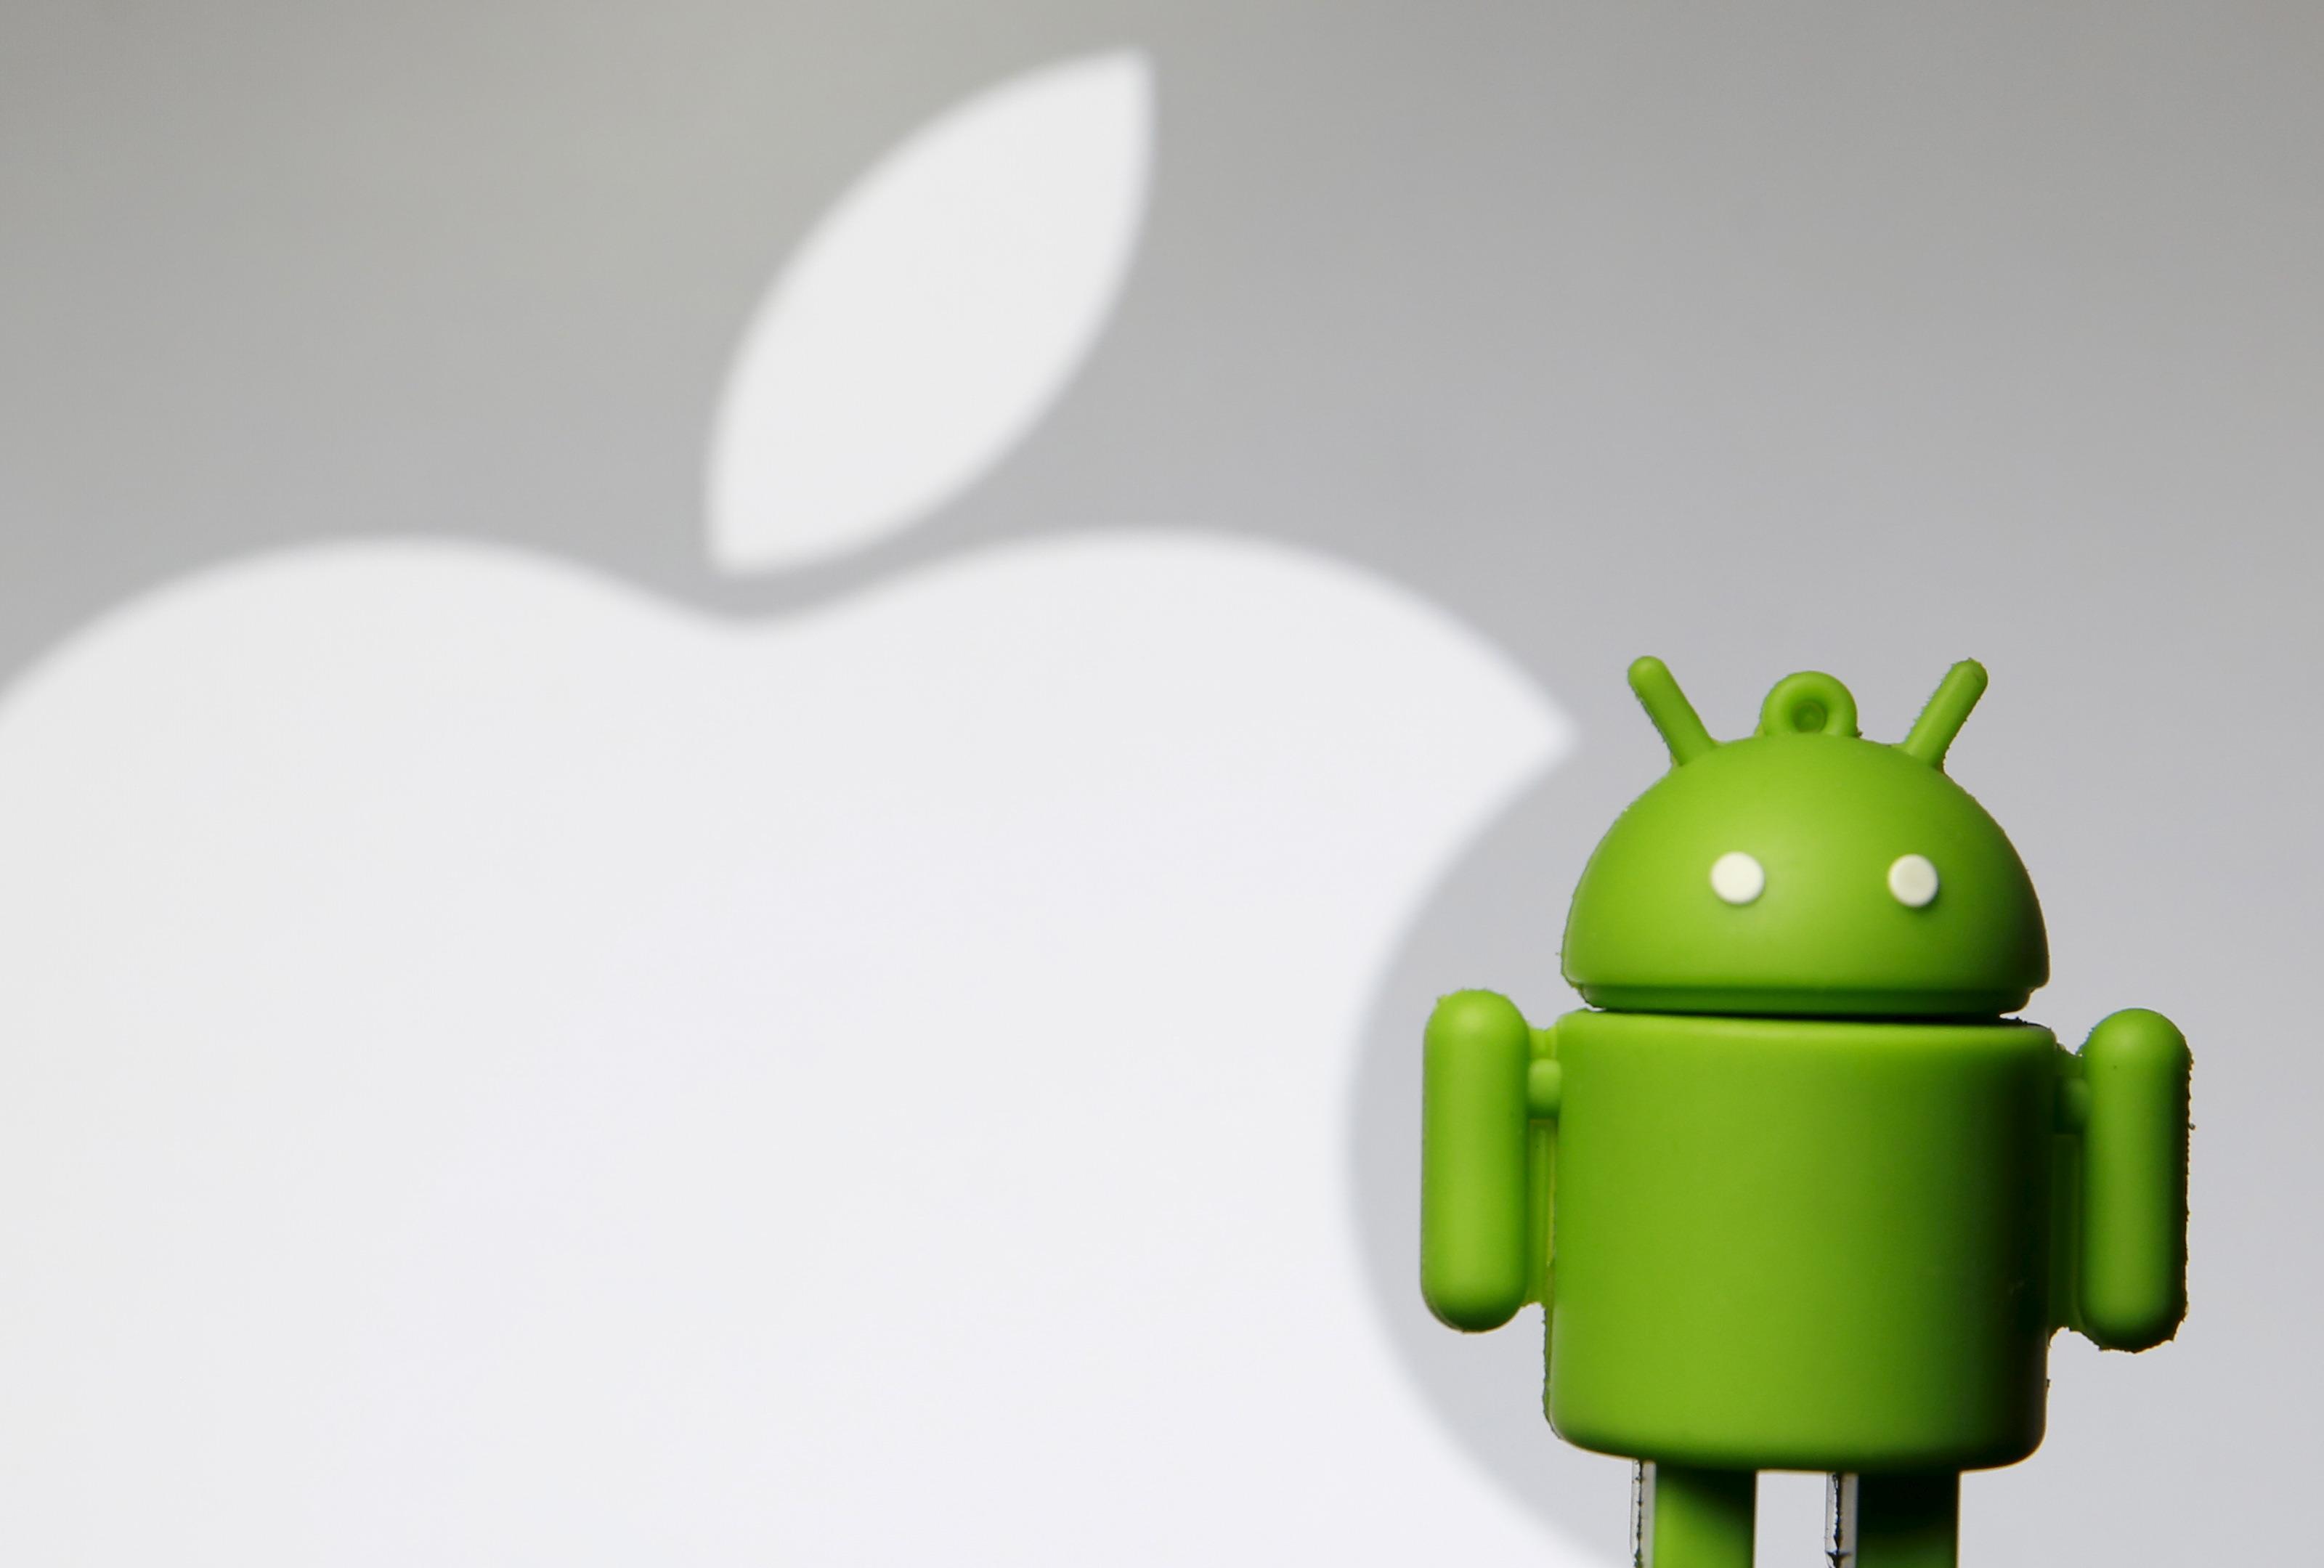 Google 行動搜尋營收,竟有 75% 靠 Apple iOS 賺來